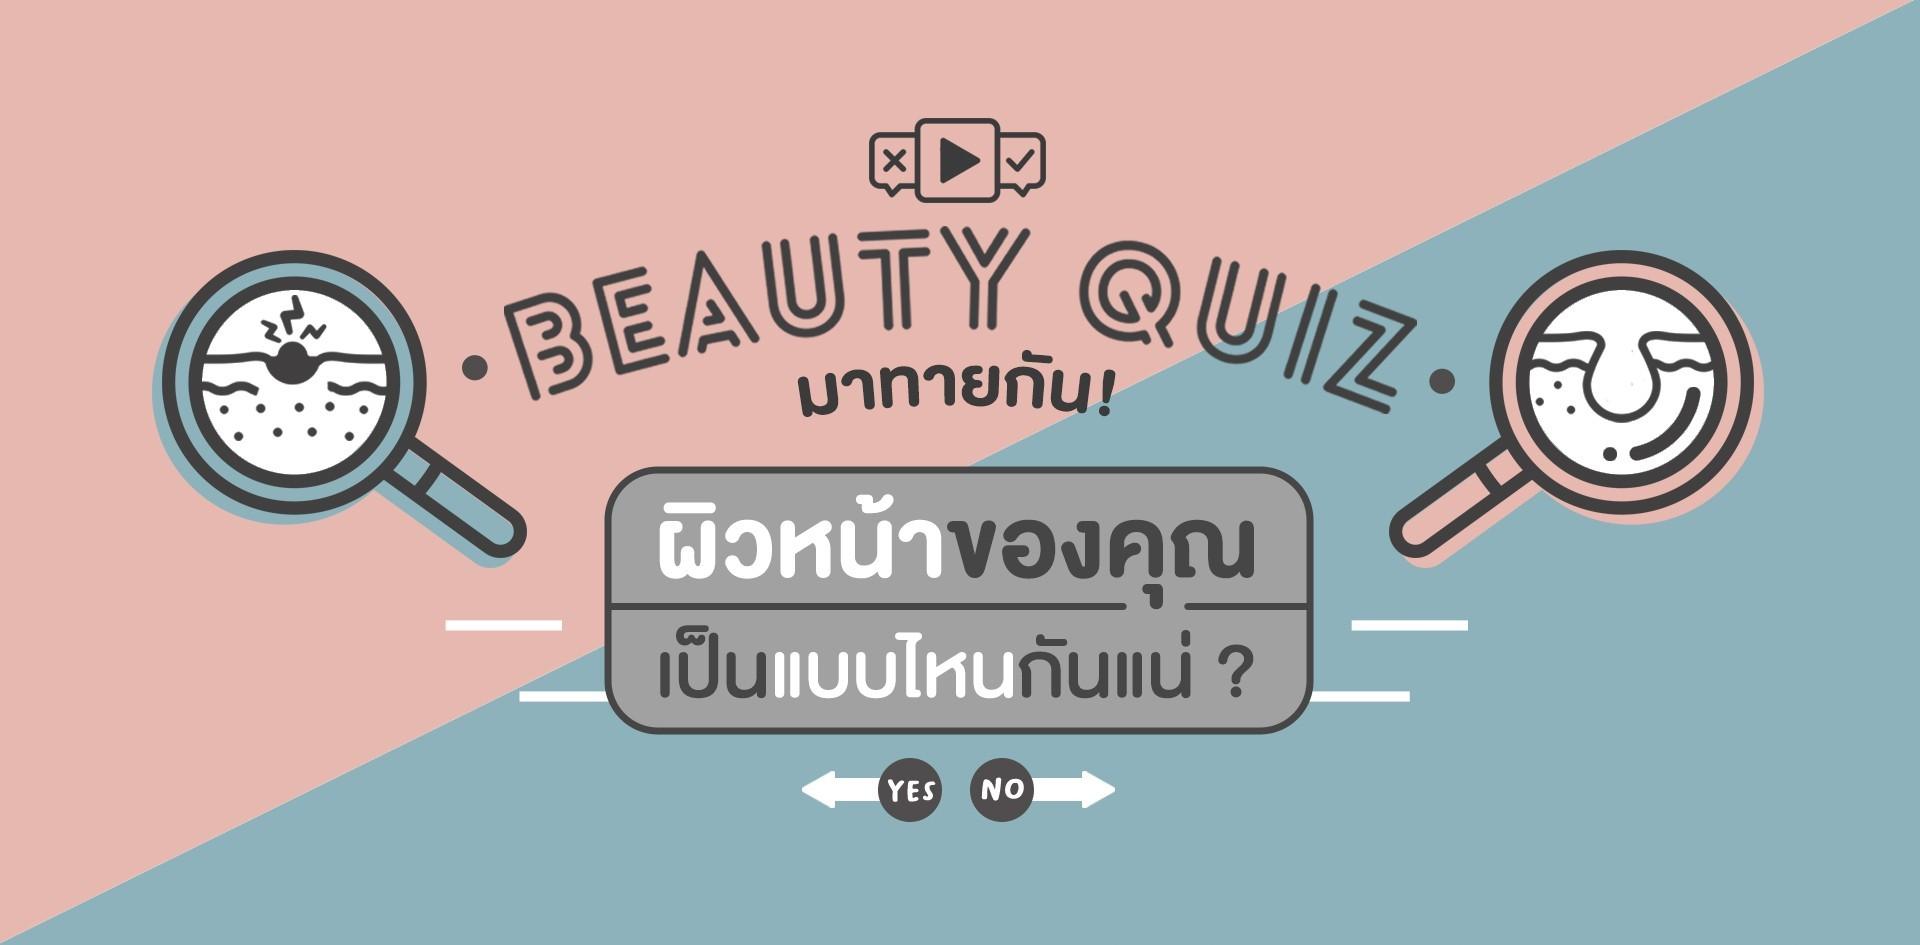 [Beauty Quiz] มาทายกัน! ผิวหน้าของเราเป็นแบบไหนกันแน่